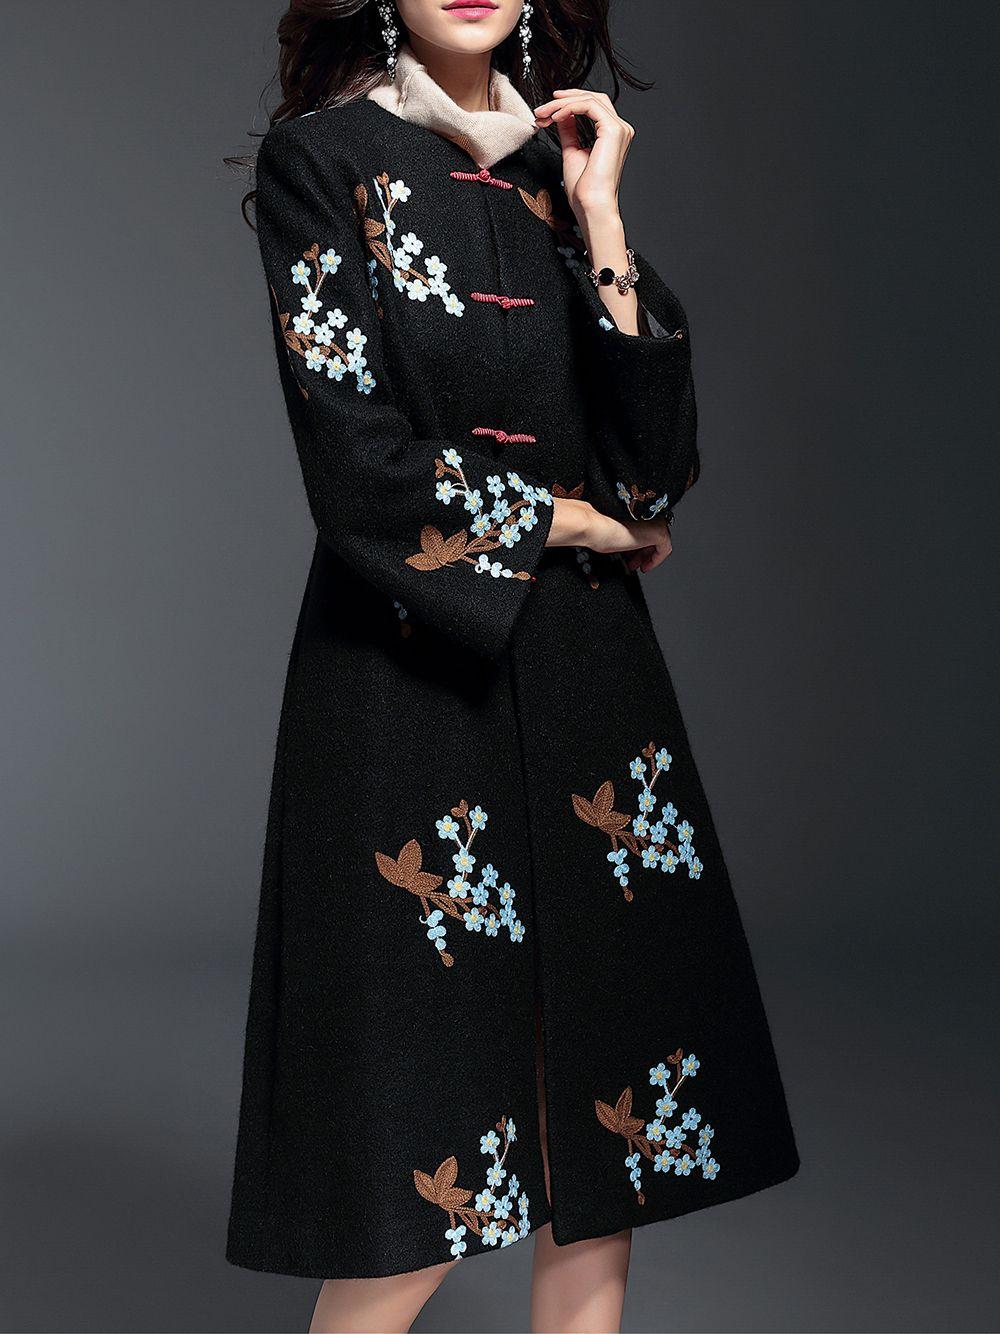 Image of black flowers embroidered long coat clothing pinterest